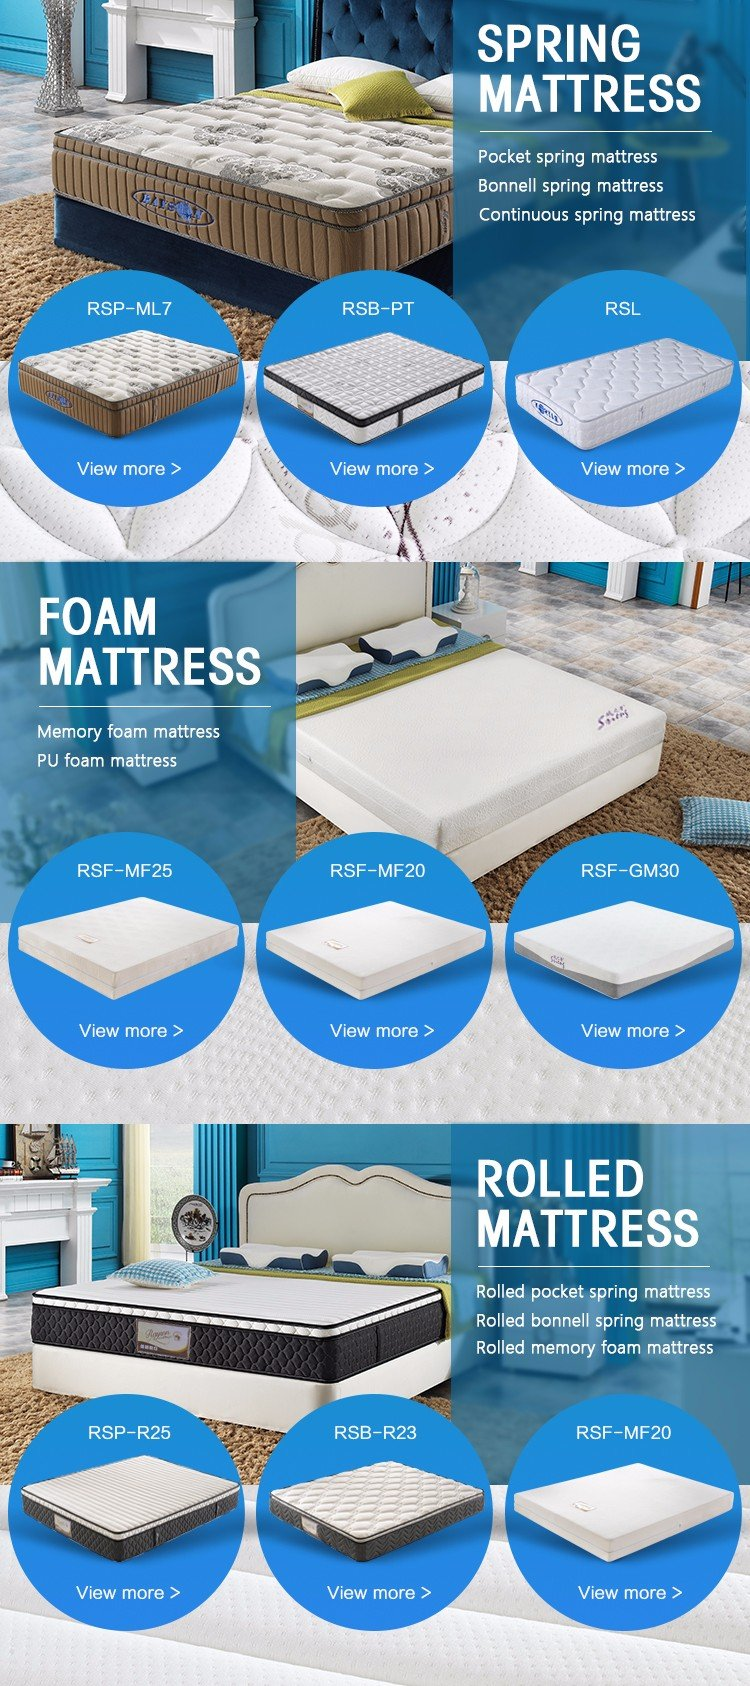 Rayson Mattress Top hotel mattress brands Supply-9